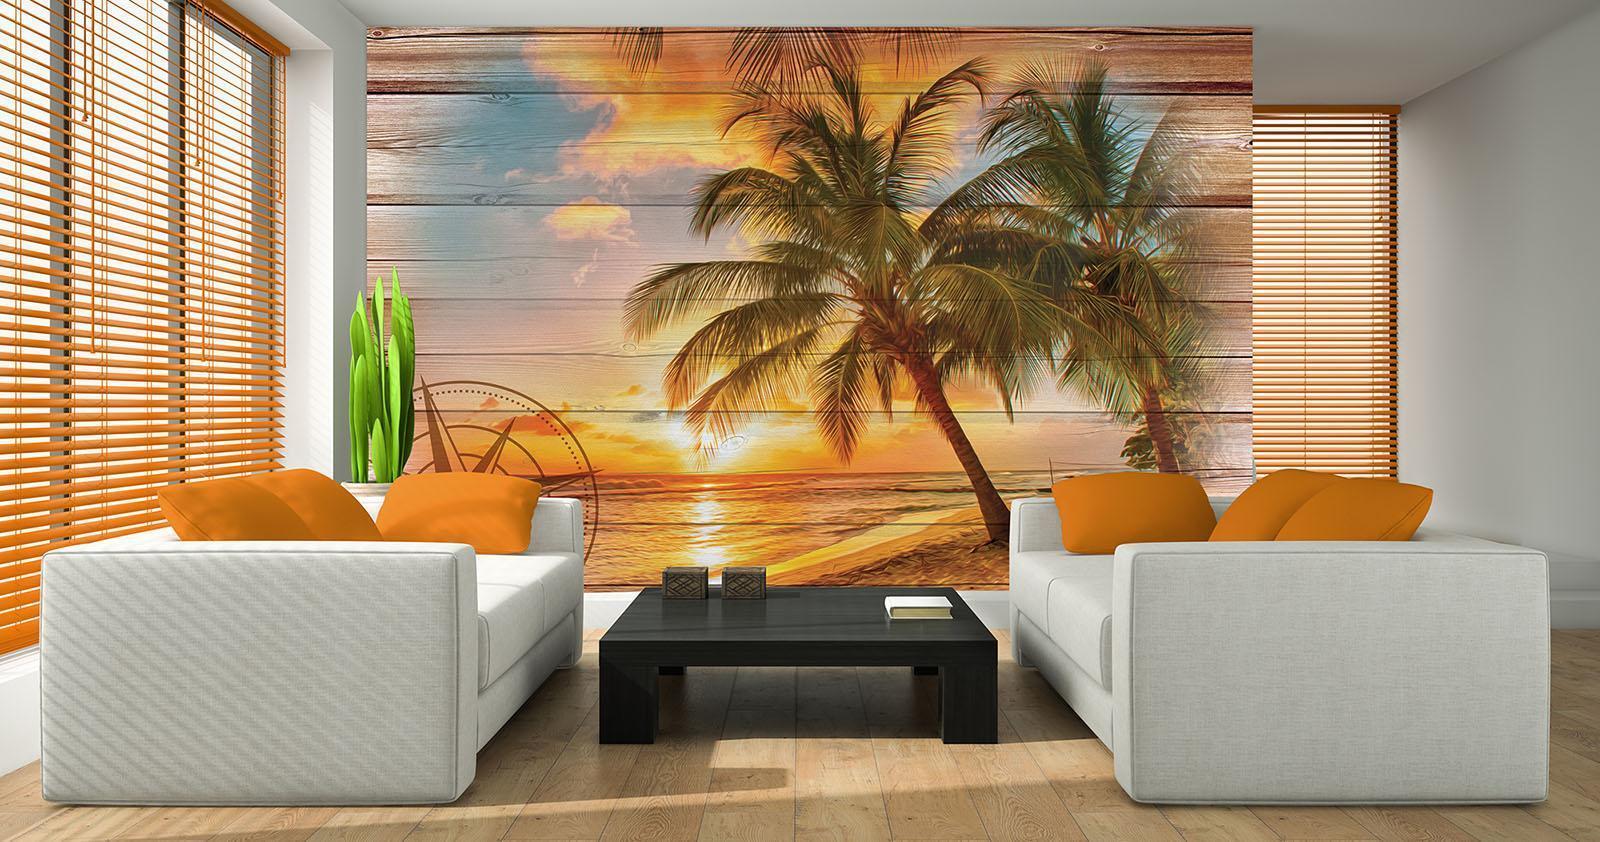 Vließ Fototapete Tapete Wandbild Strand auf dem Bretter 310027_VENMVT